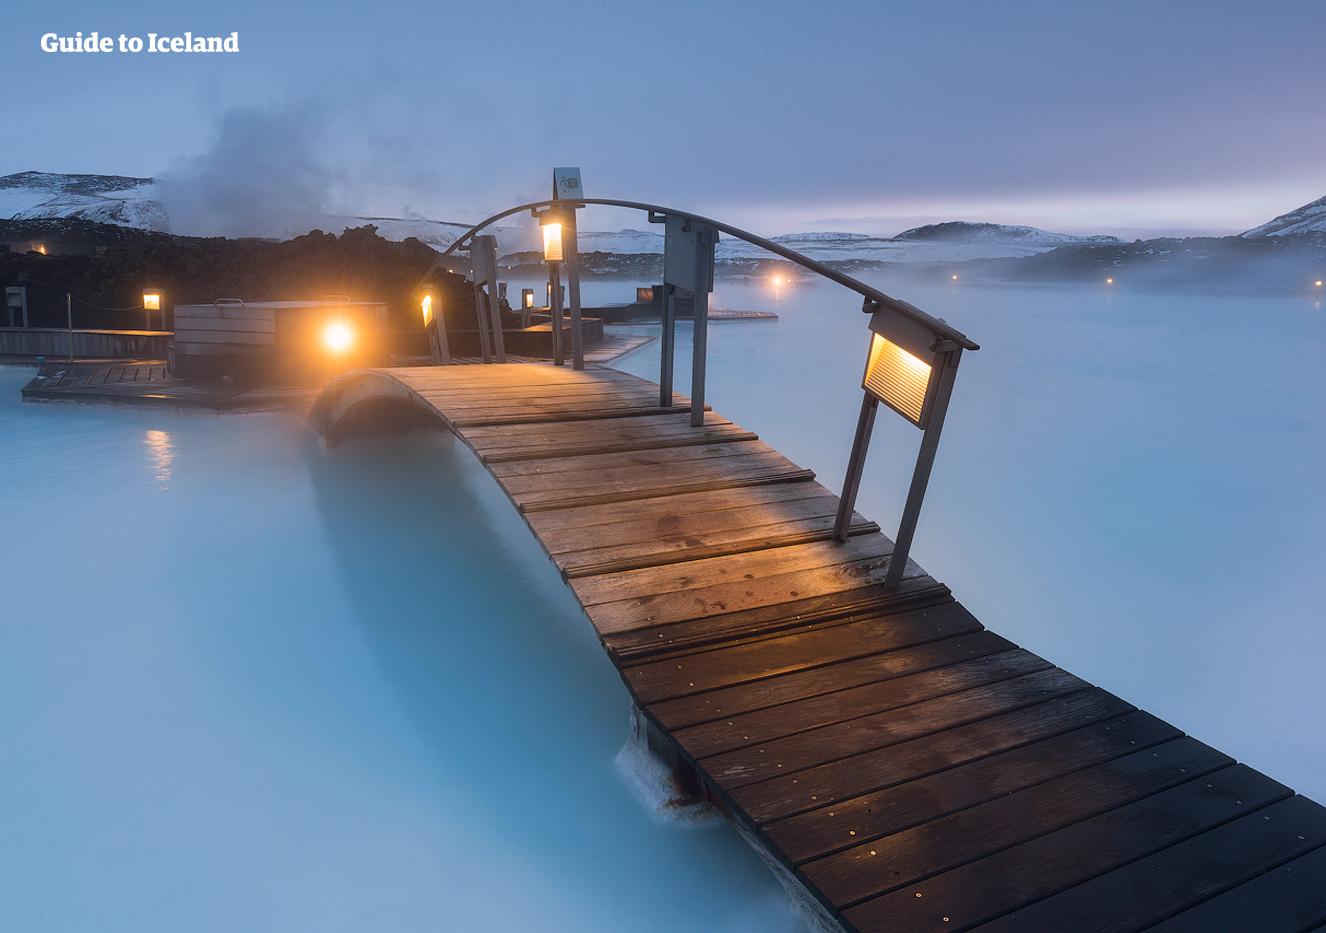 Ett bra botemedel mot jetlag är ett bad i Blå lagunens geotermiska vatten